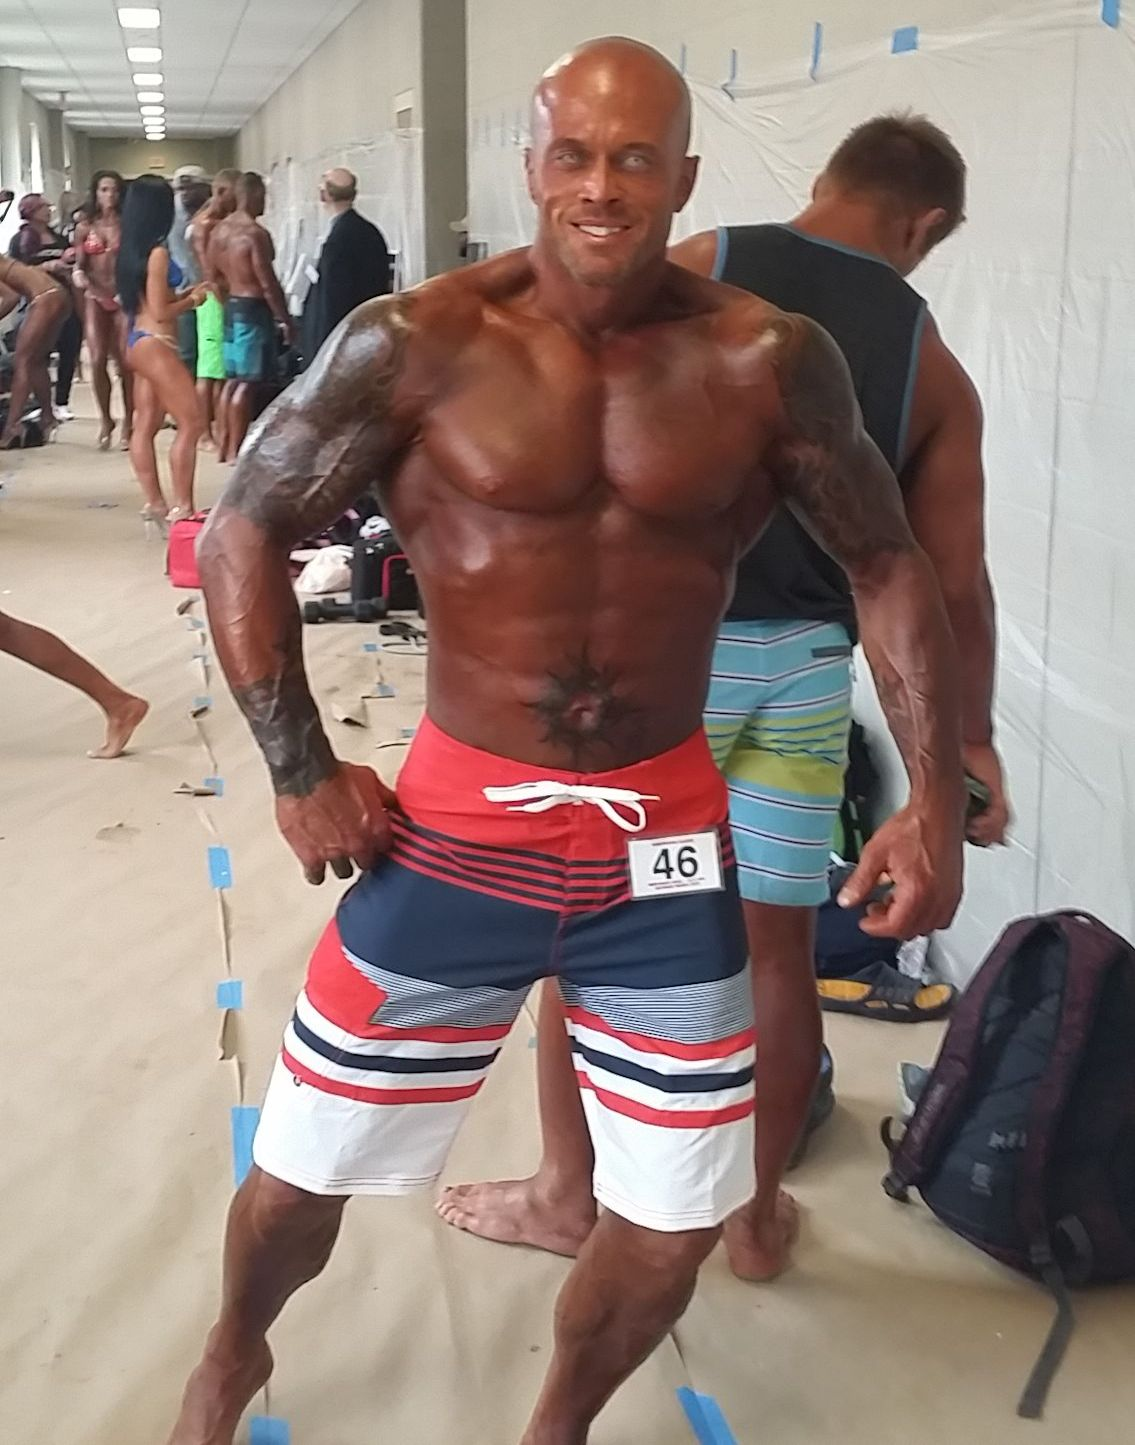 2015 NPC Montanari Bros Powerhouse Classic Men's Physique Competitor #46 John Joseph Quinlan #JohnQuinlan